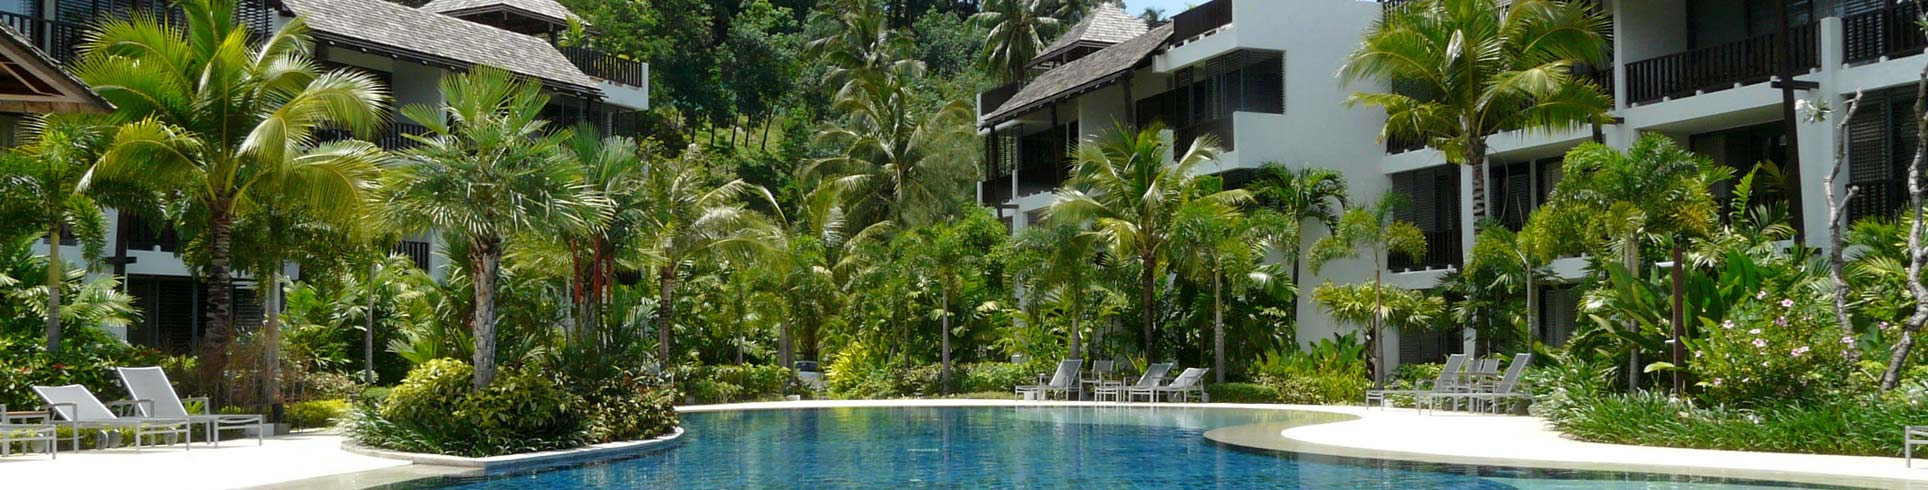 Bangtao Beach Gardens - Luxury Apartments For Sale